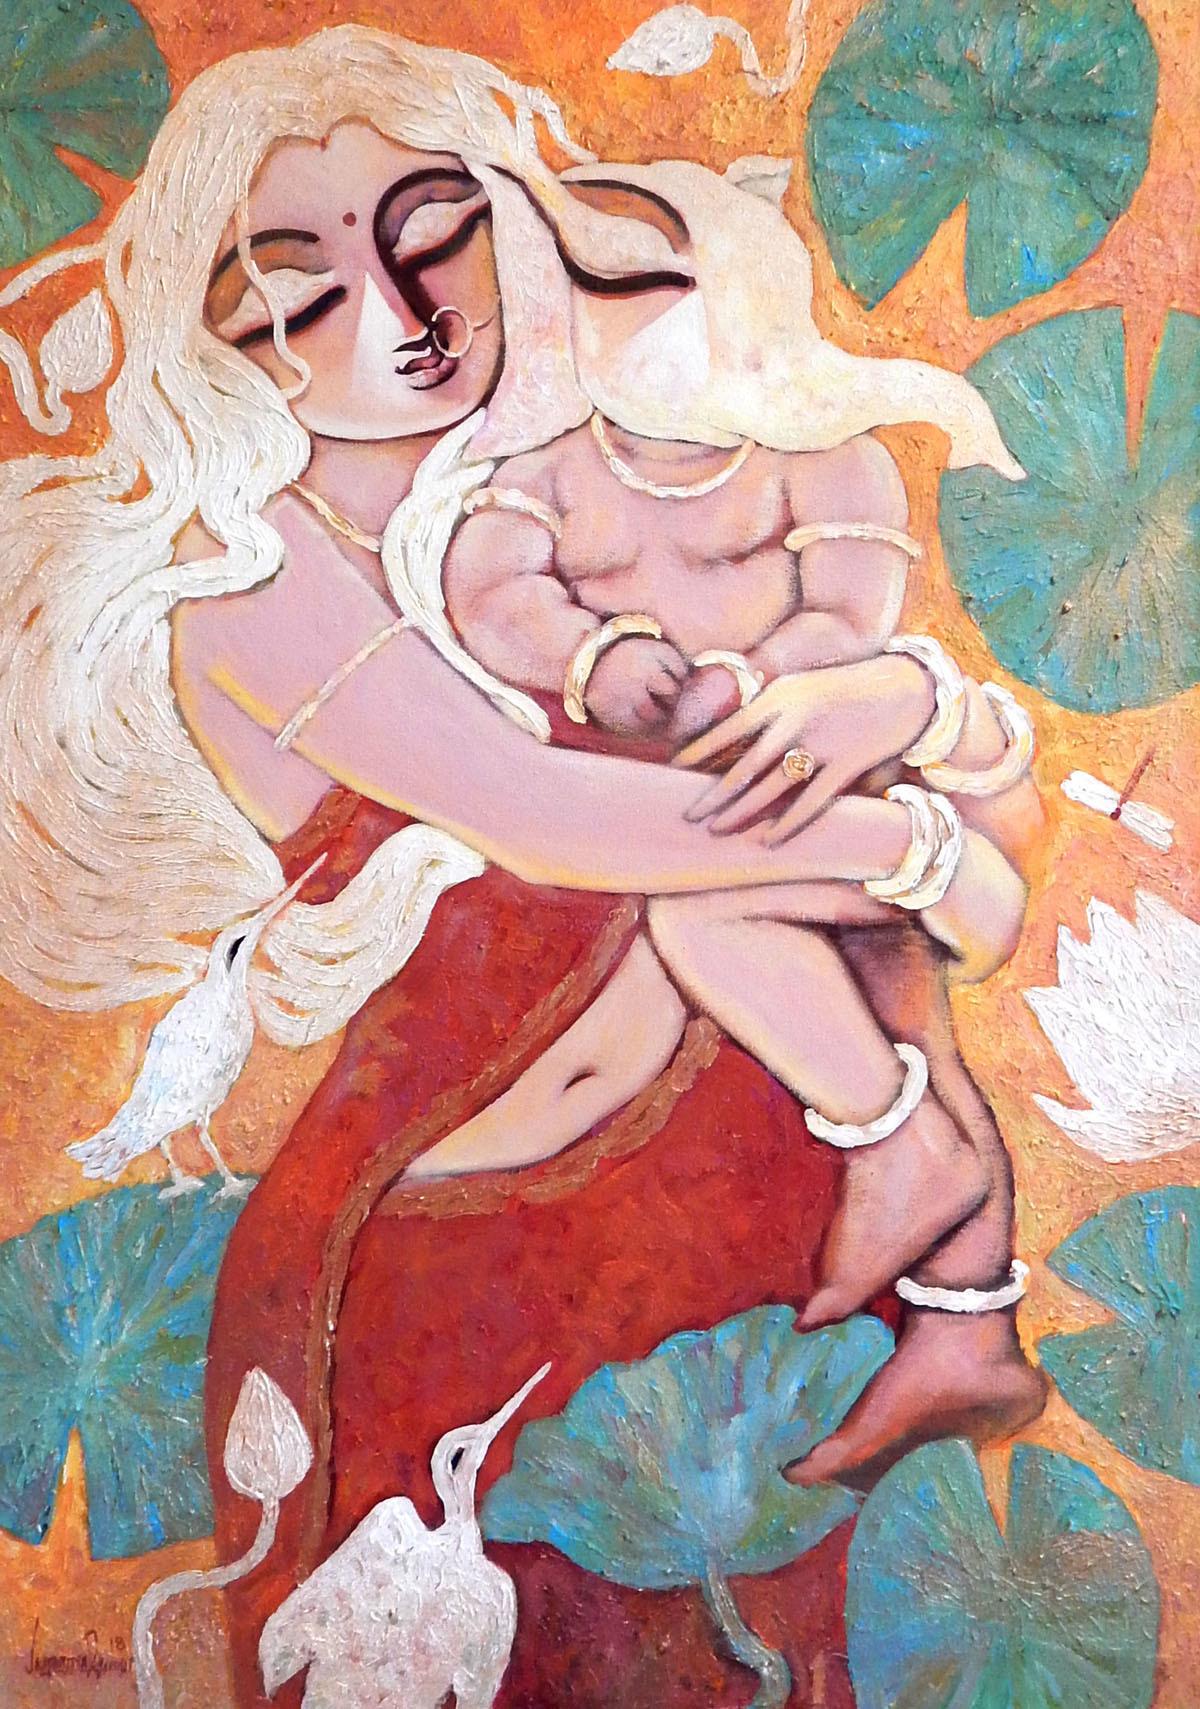 Parvatinandan 34x24 inch acrylic on canvas